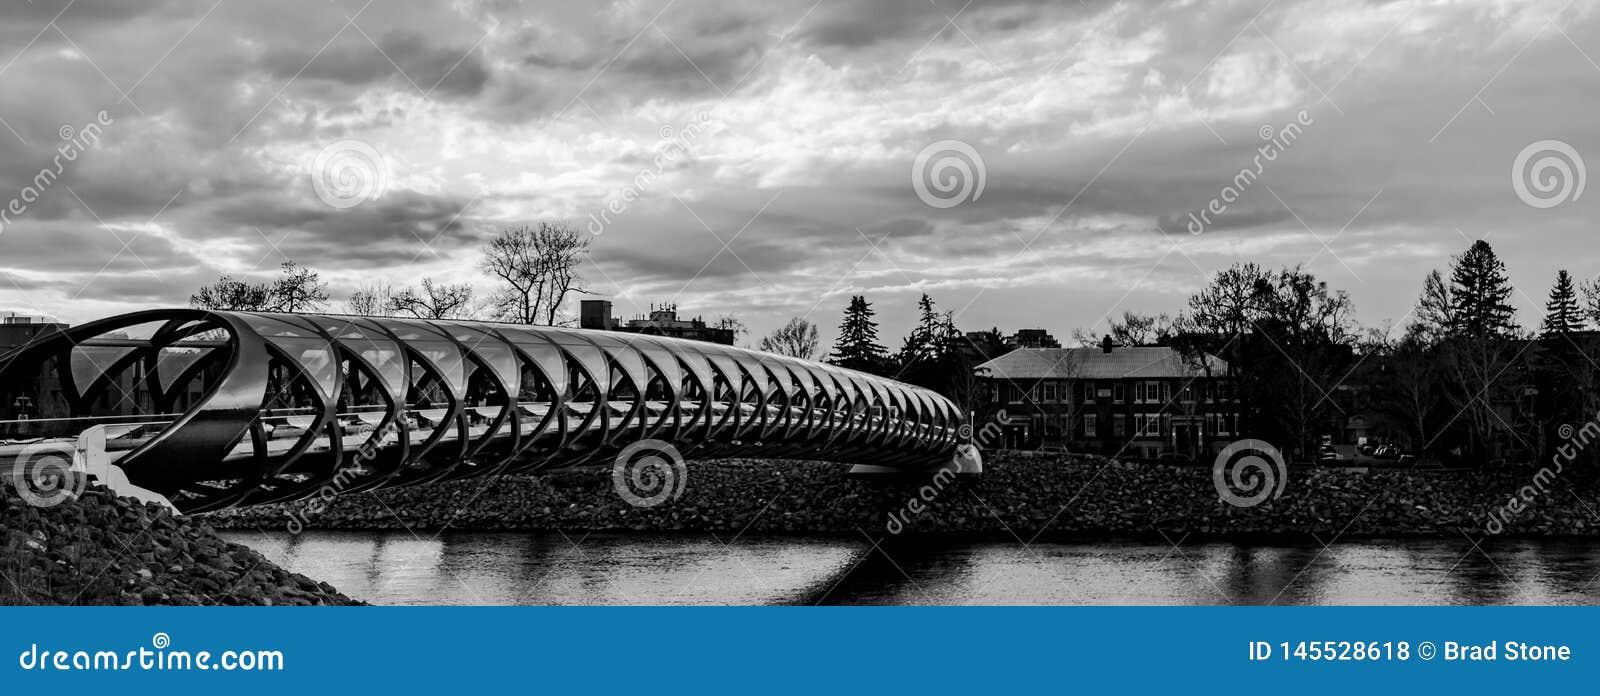 Мост Калгари мира